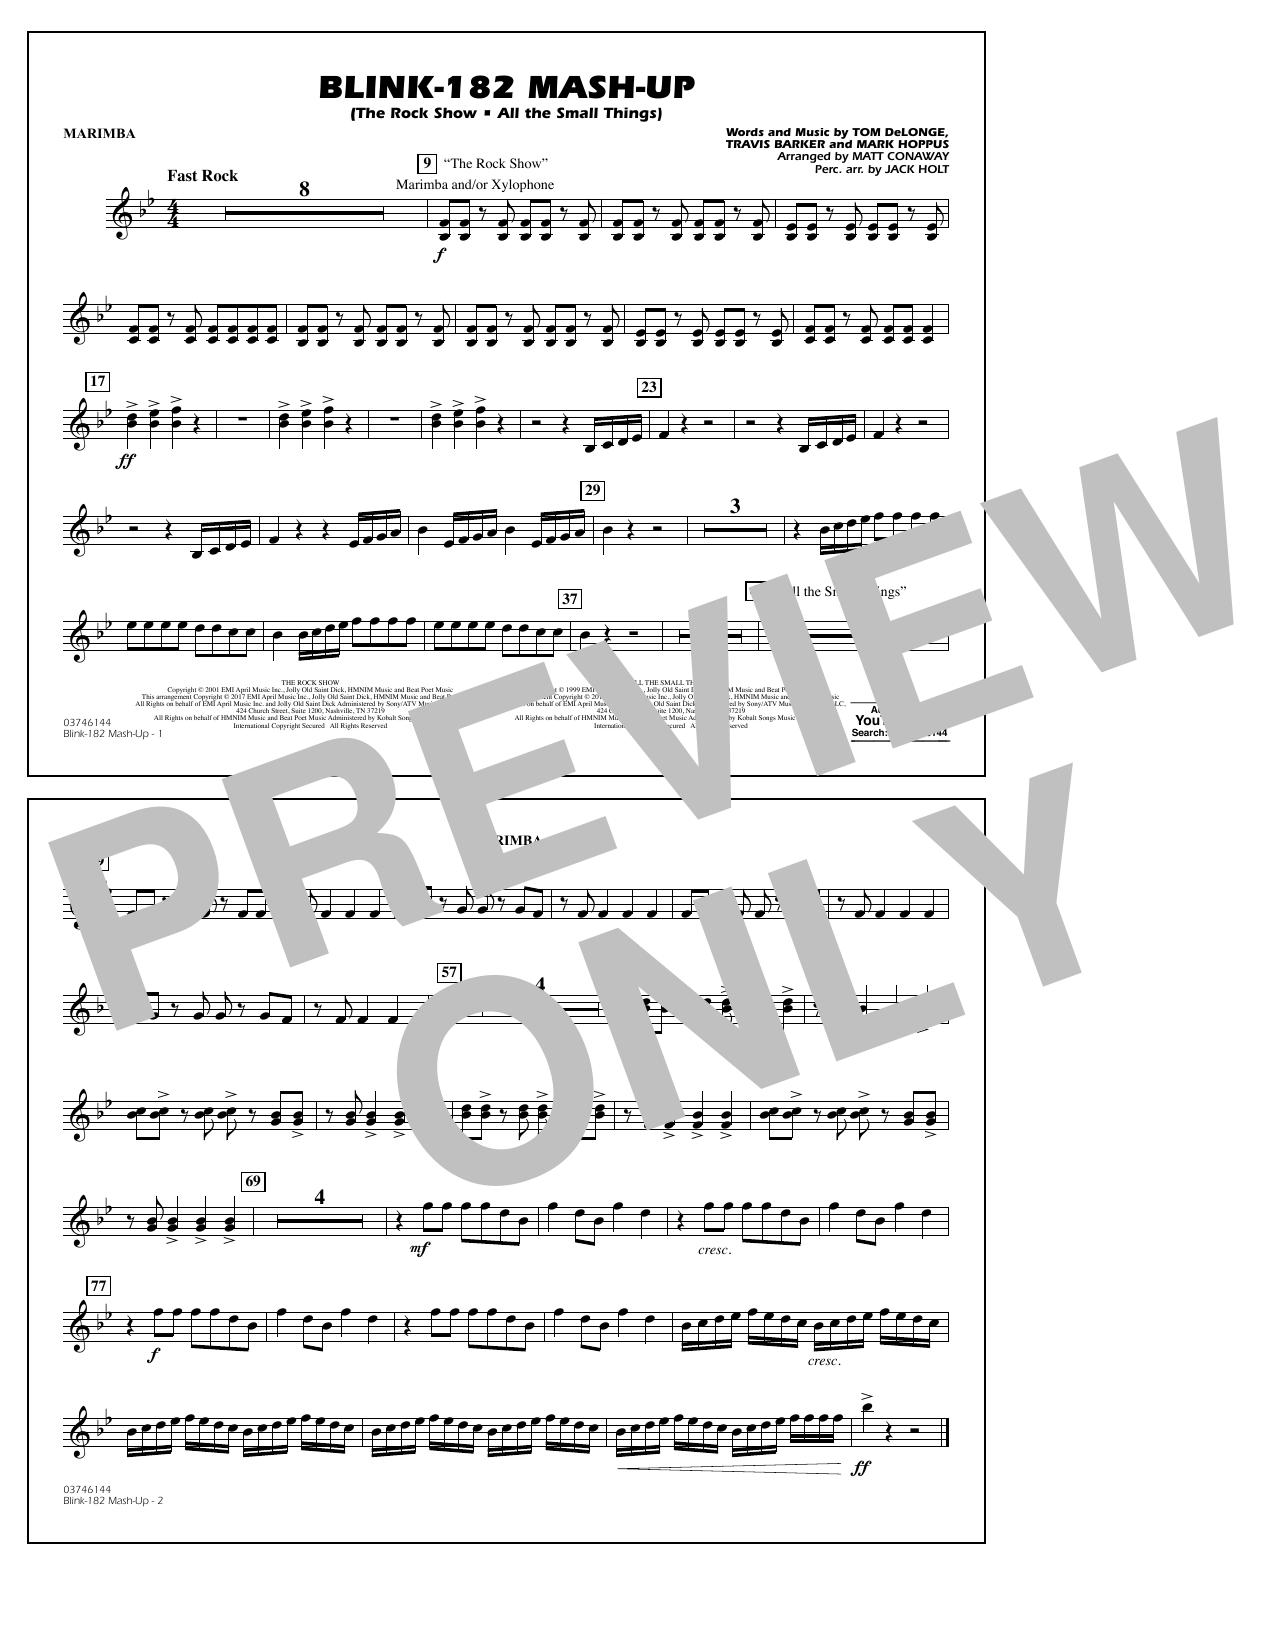 Blink-182 Mash-Up - Marimba Sheet Music